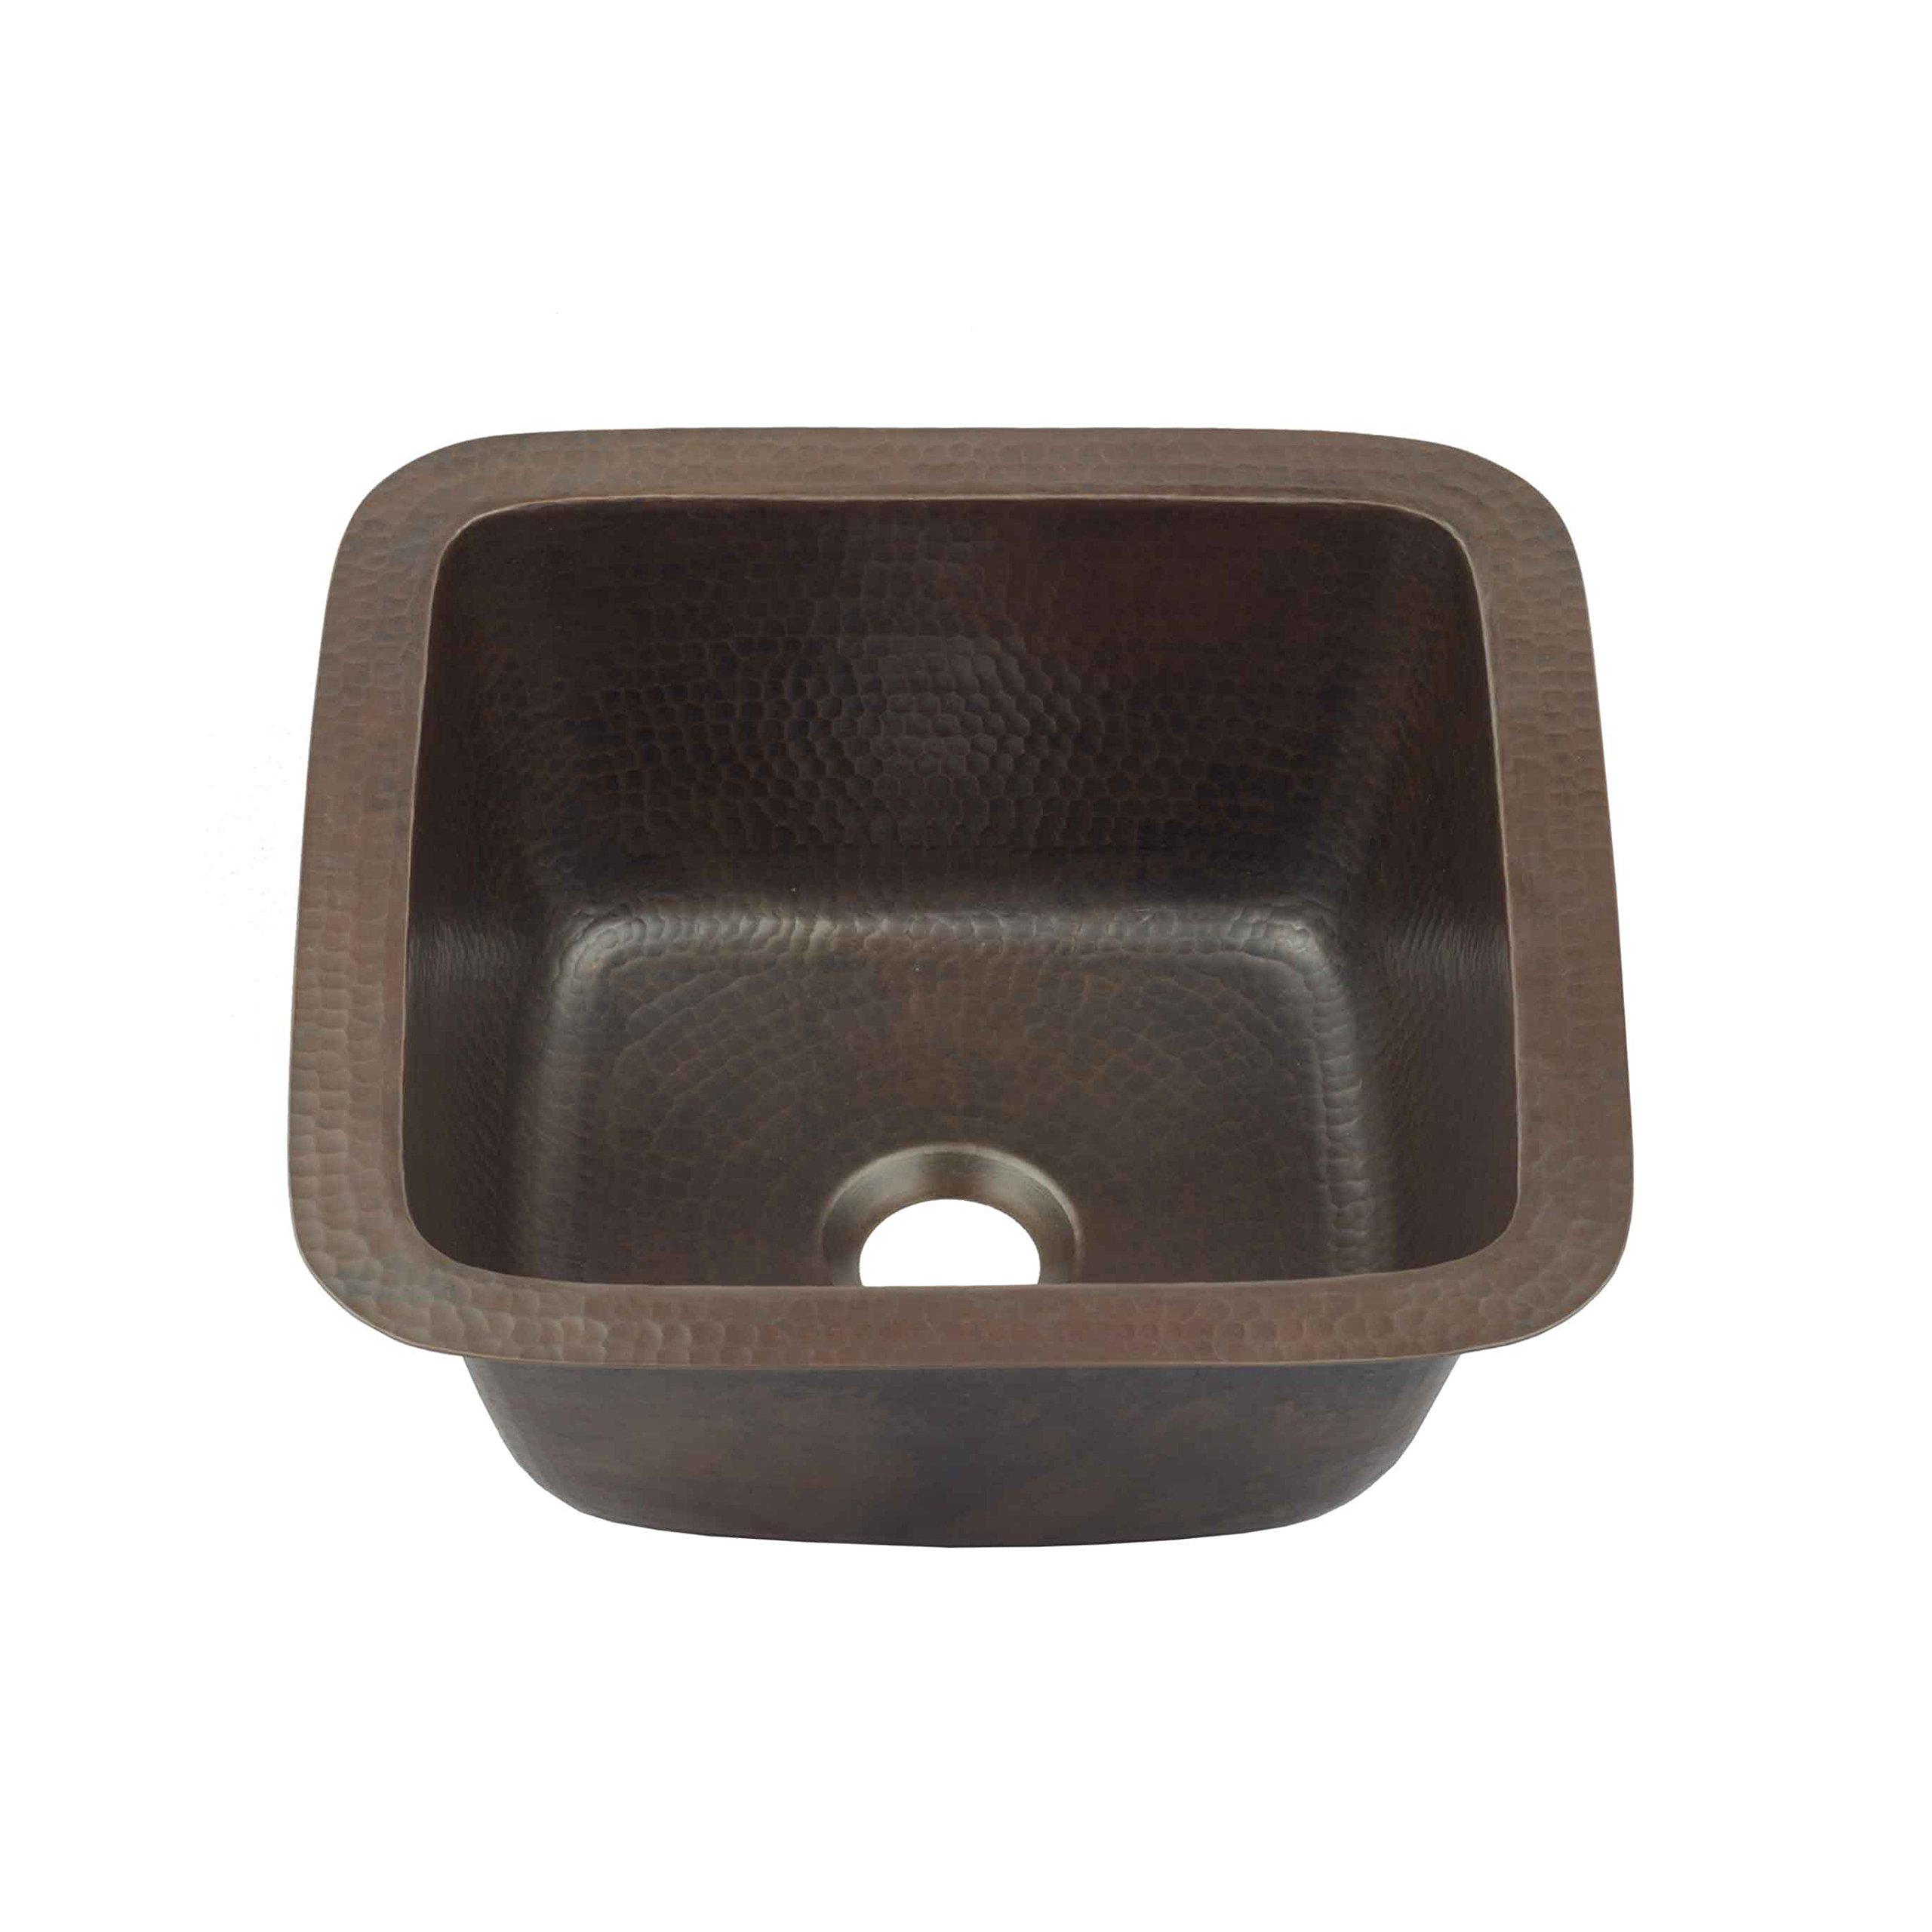 Sinkology P1U-1212BC Pollock Undermount Handmade Pure Solid 0-Hole Bar Prep Sink, 12'', Aged Copper